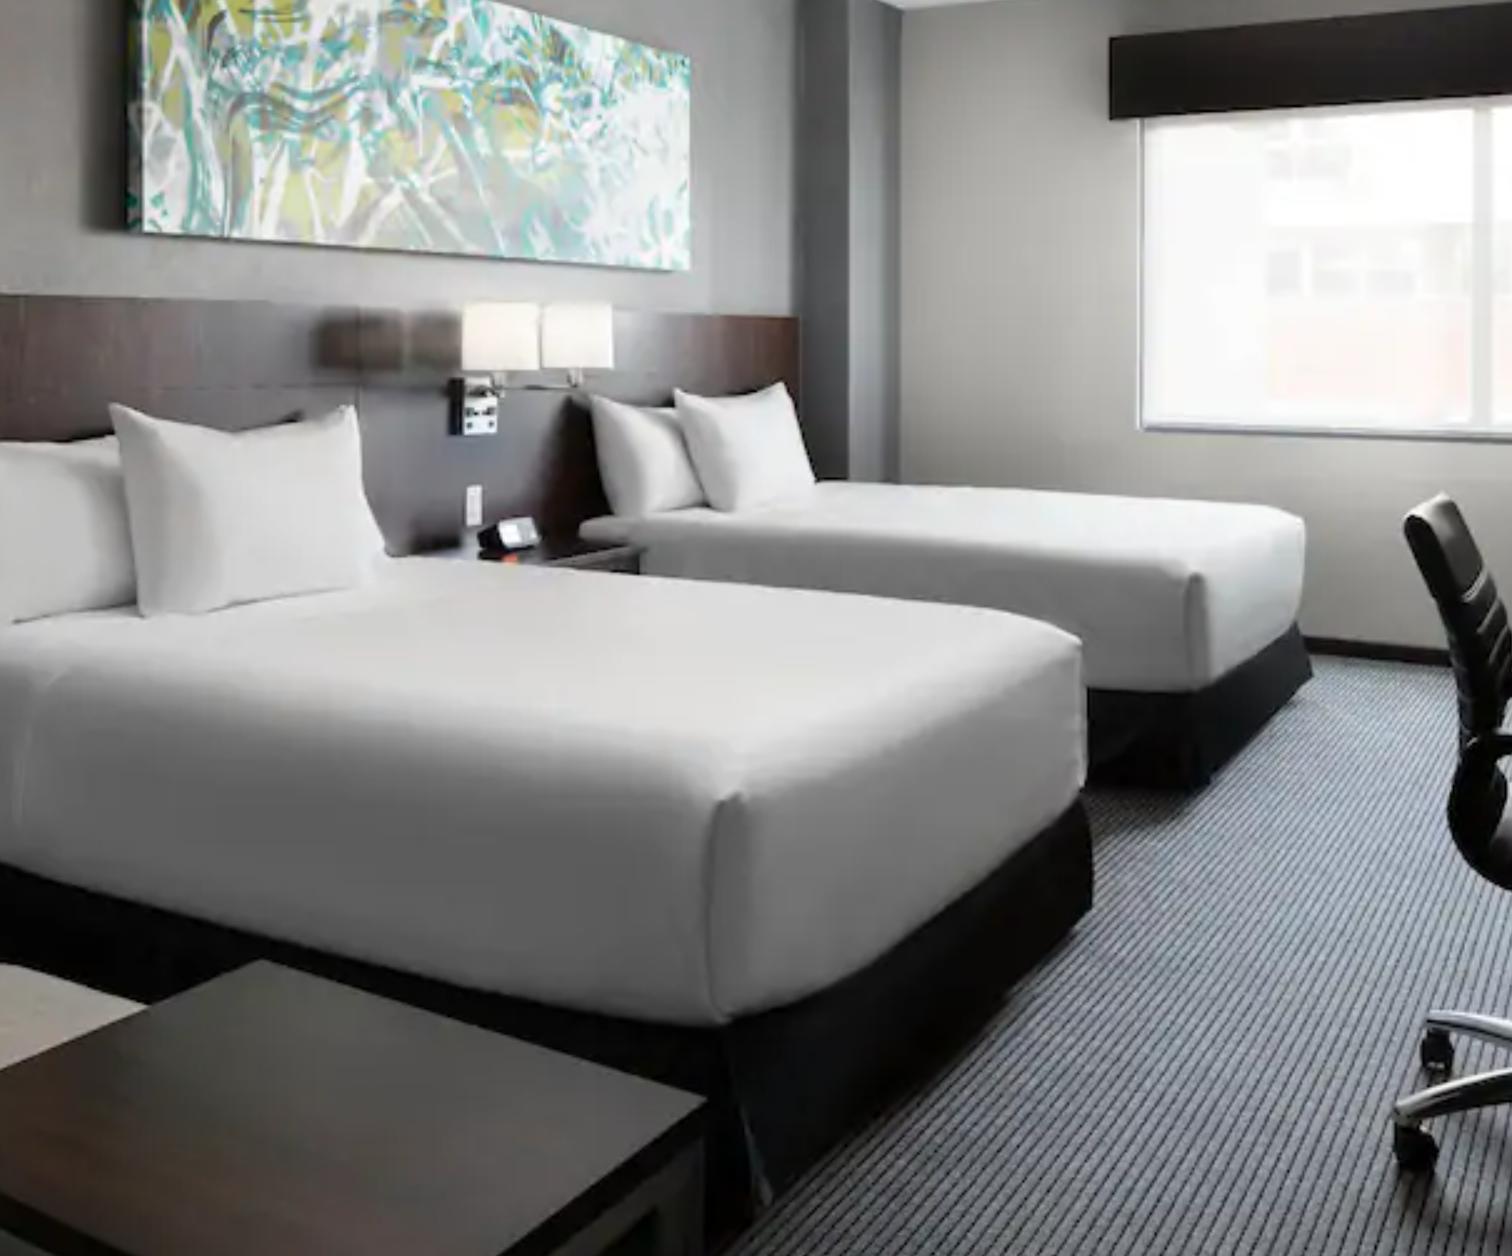 https://www.hotelsbyday.com/_data/default-hotel_image/3/19224/screenshot-2020-06-29-at-11-40-18-am.png